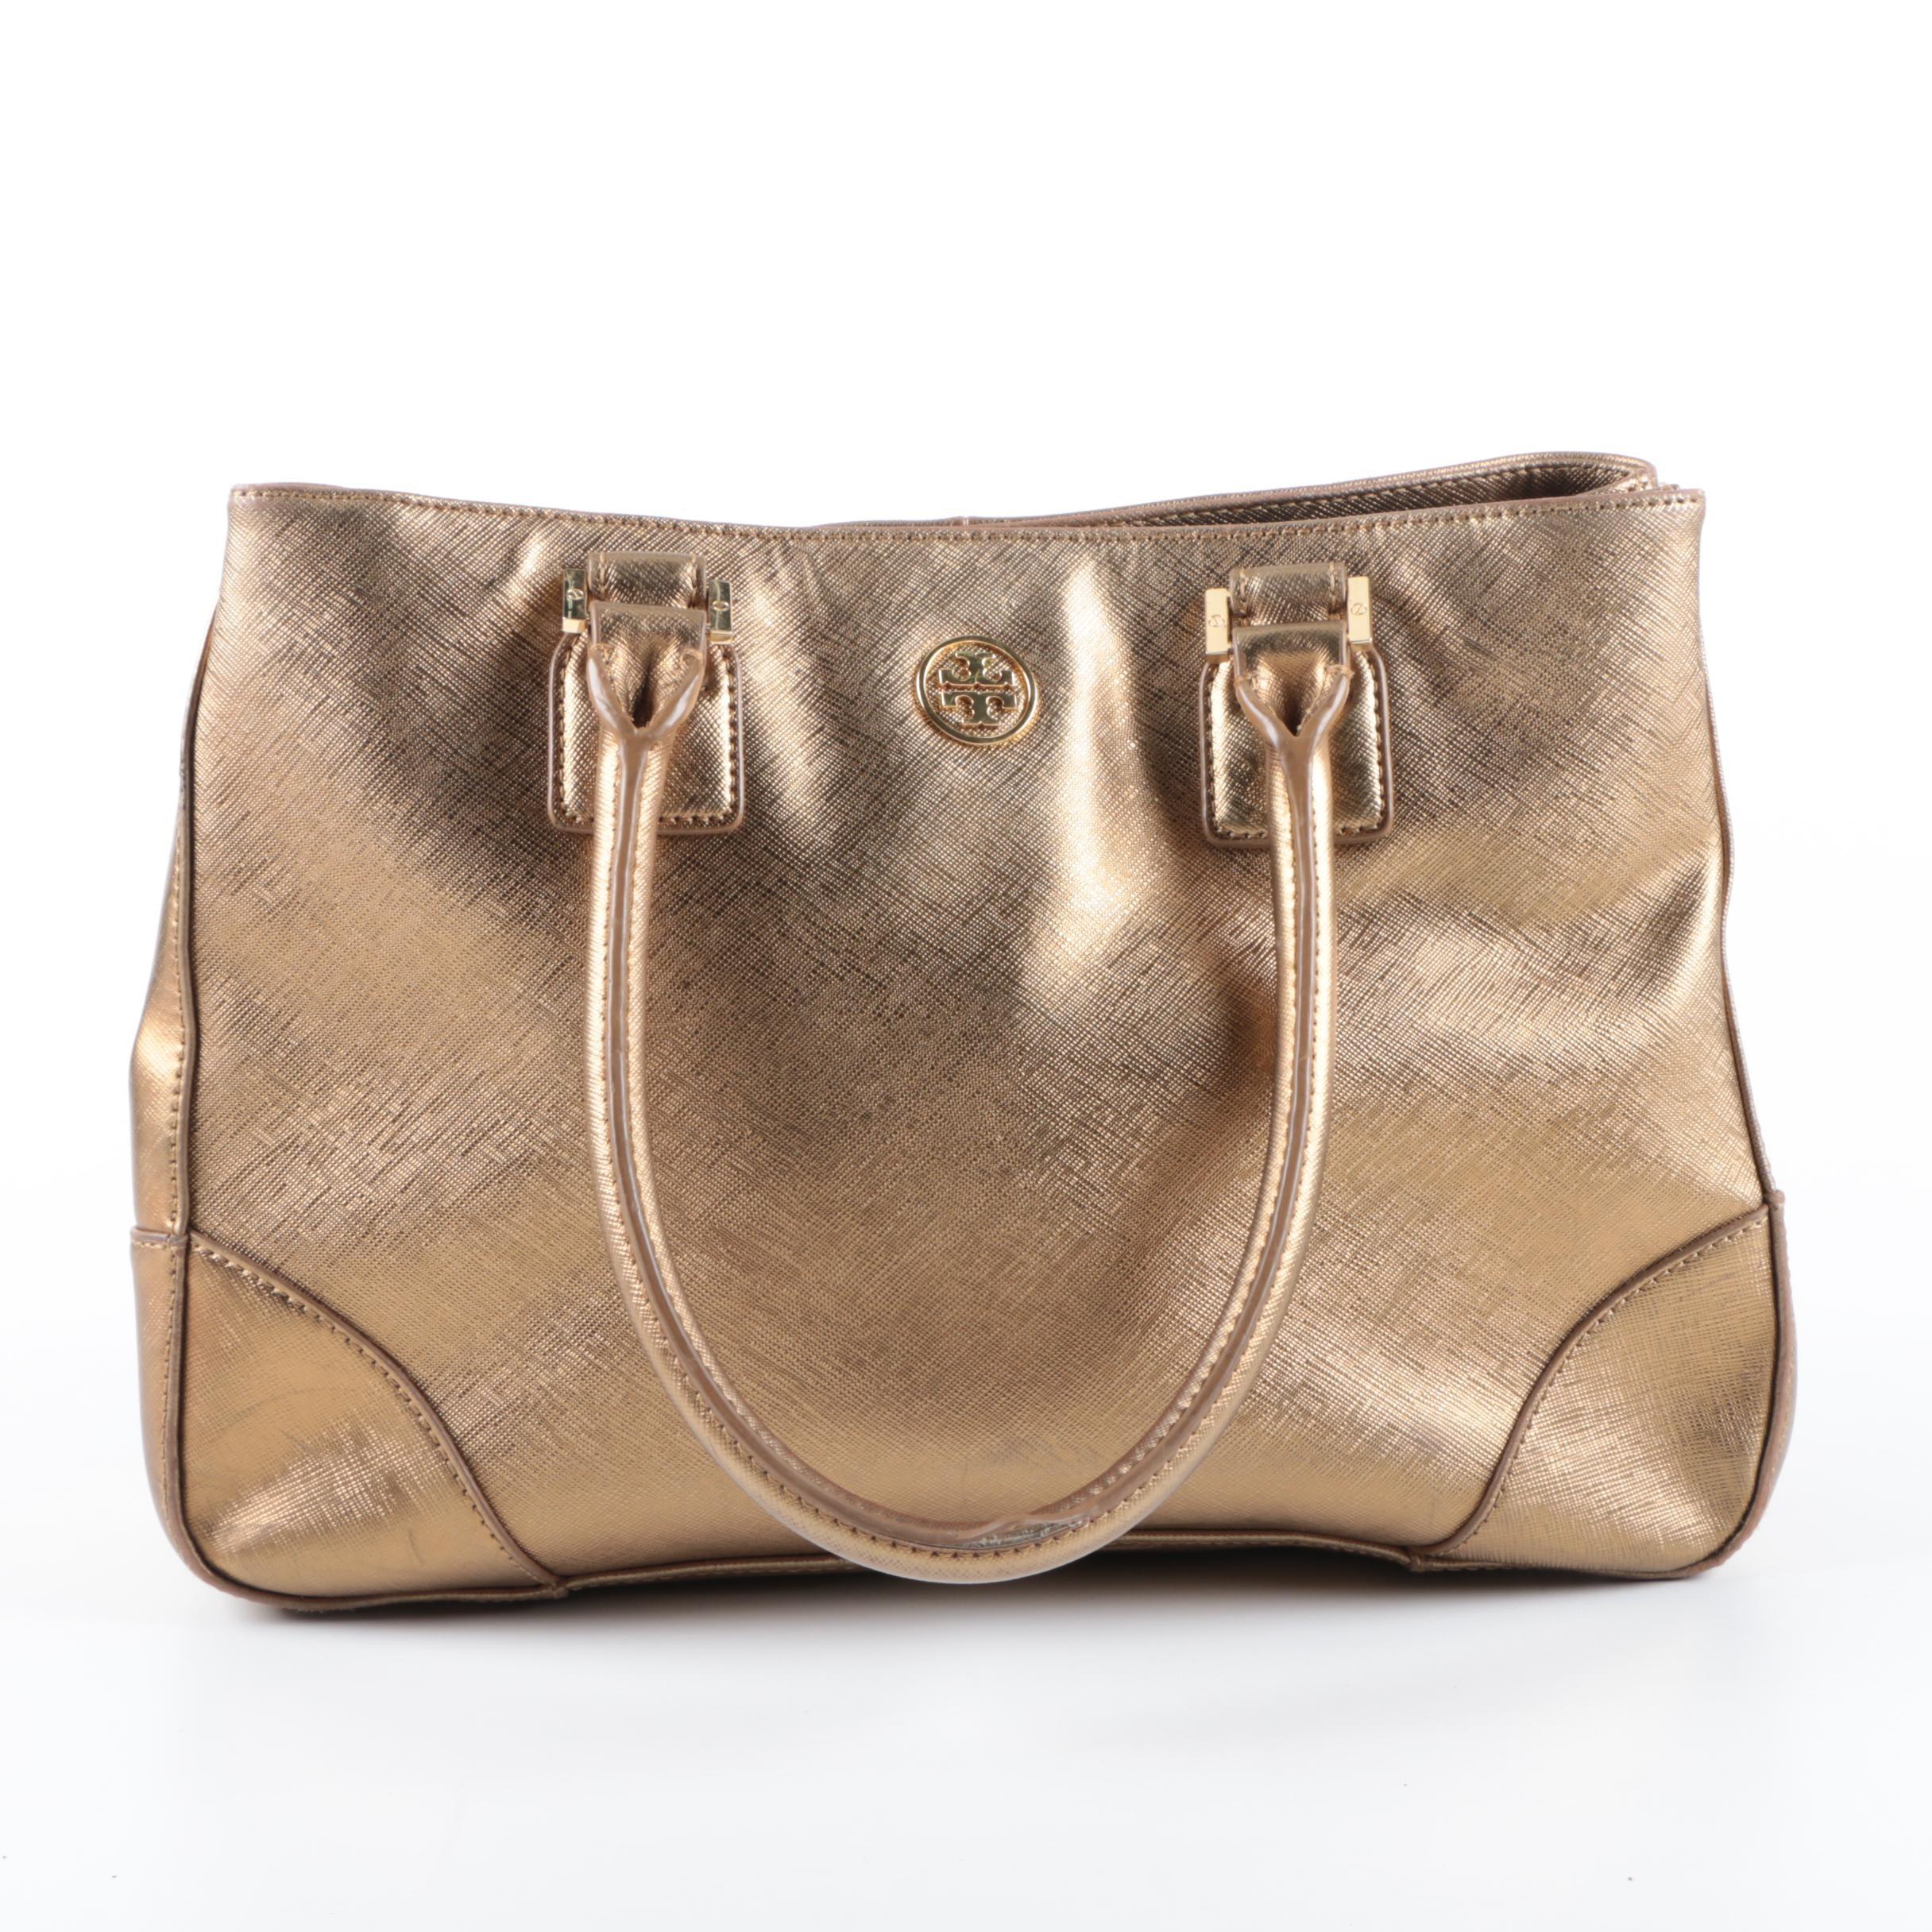 Tory Burch Textured Gold Metallic Tote Bag